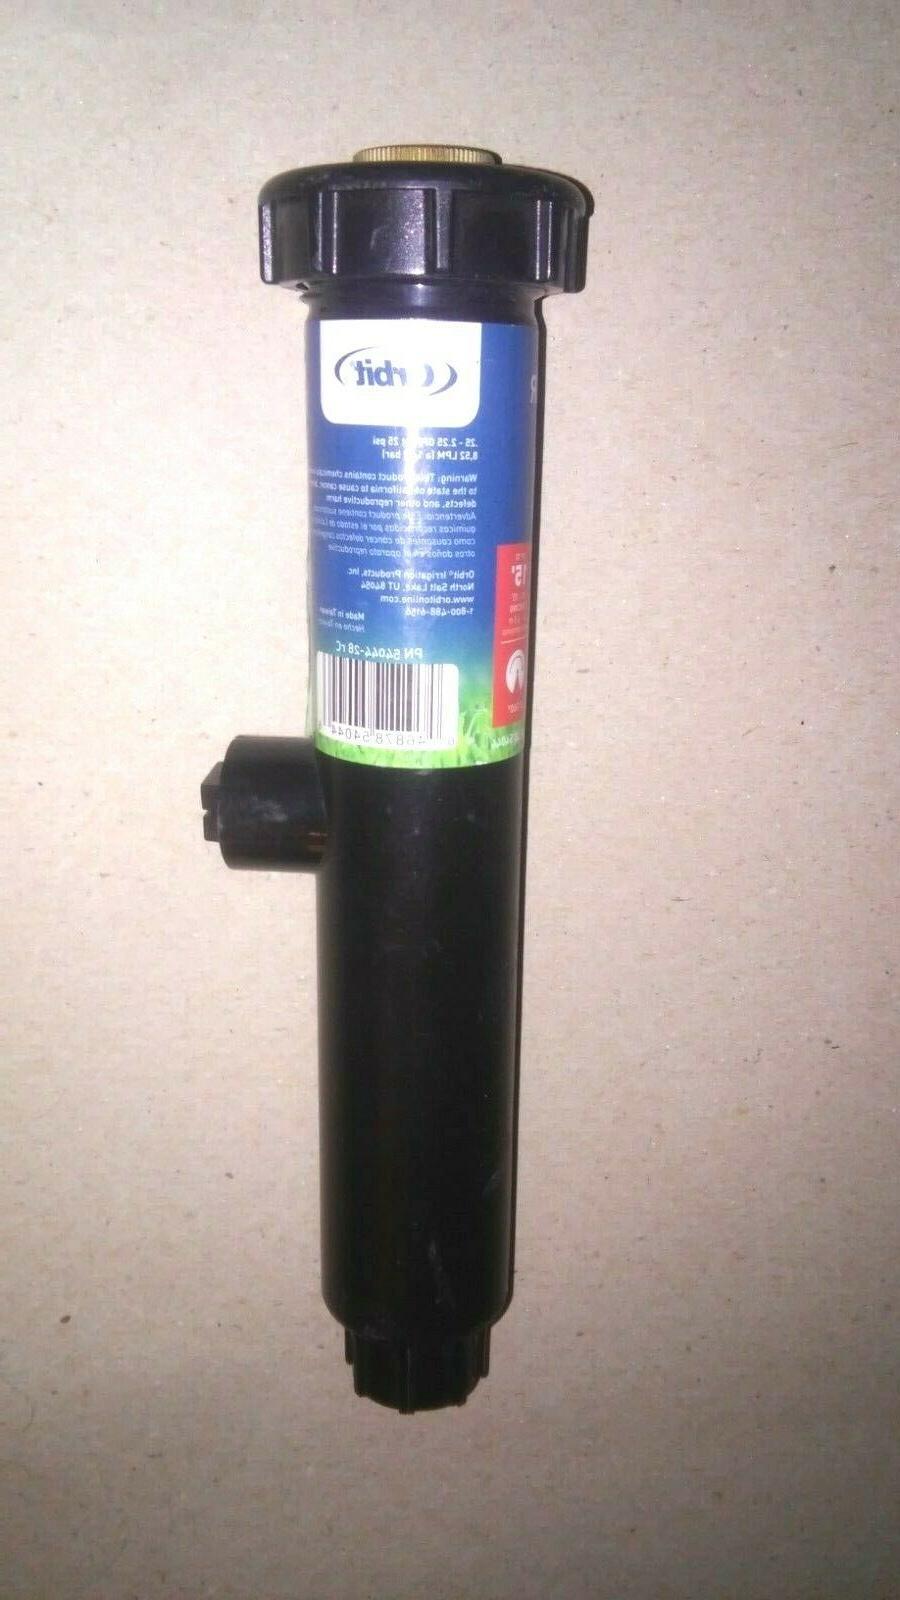 6 pop up brass head sprinklers